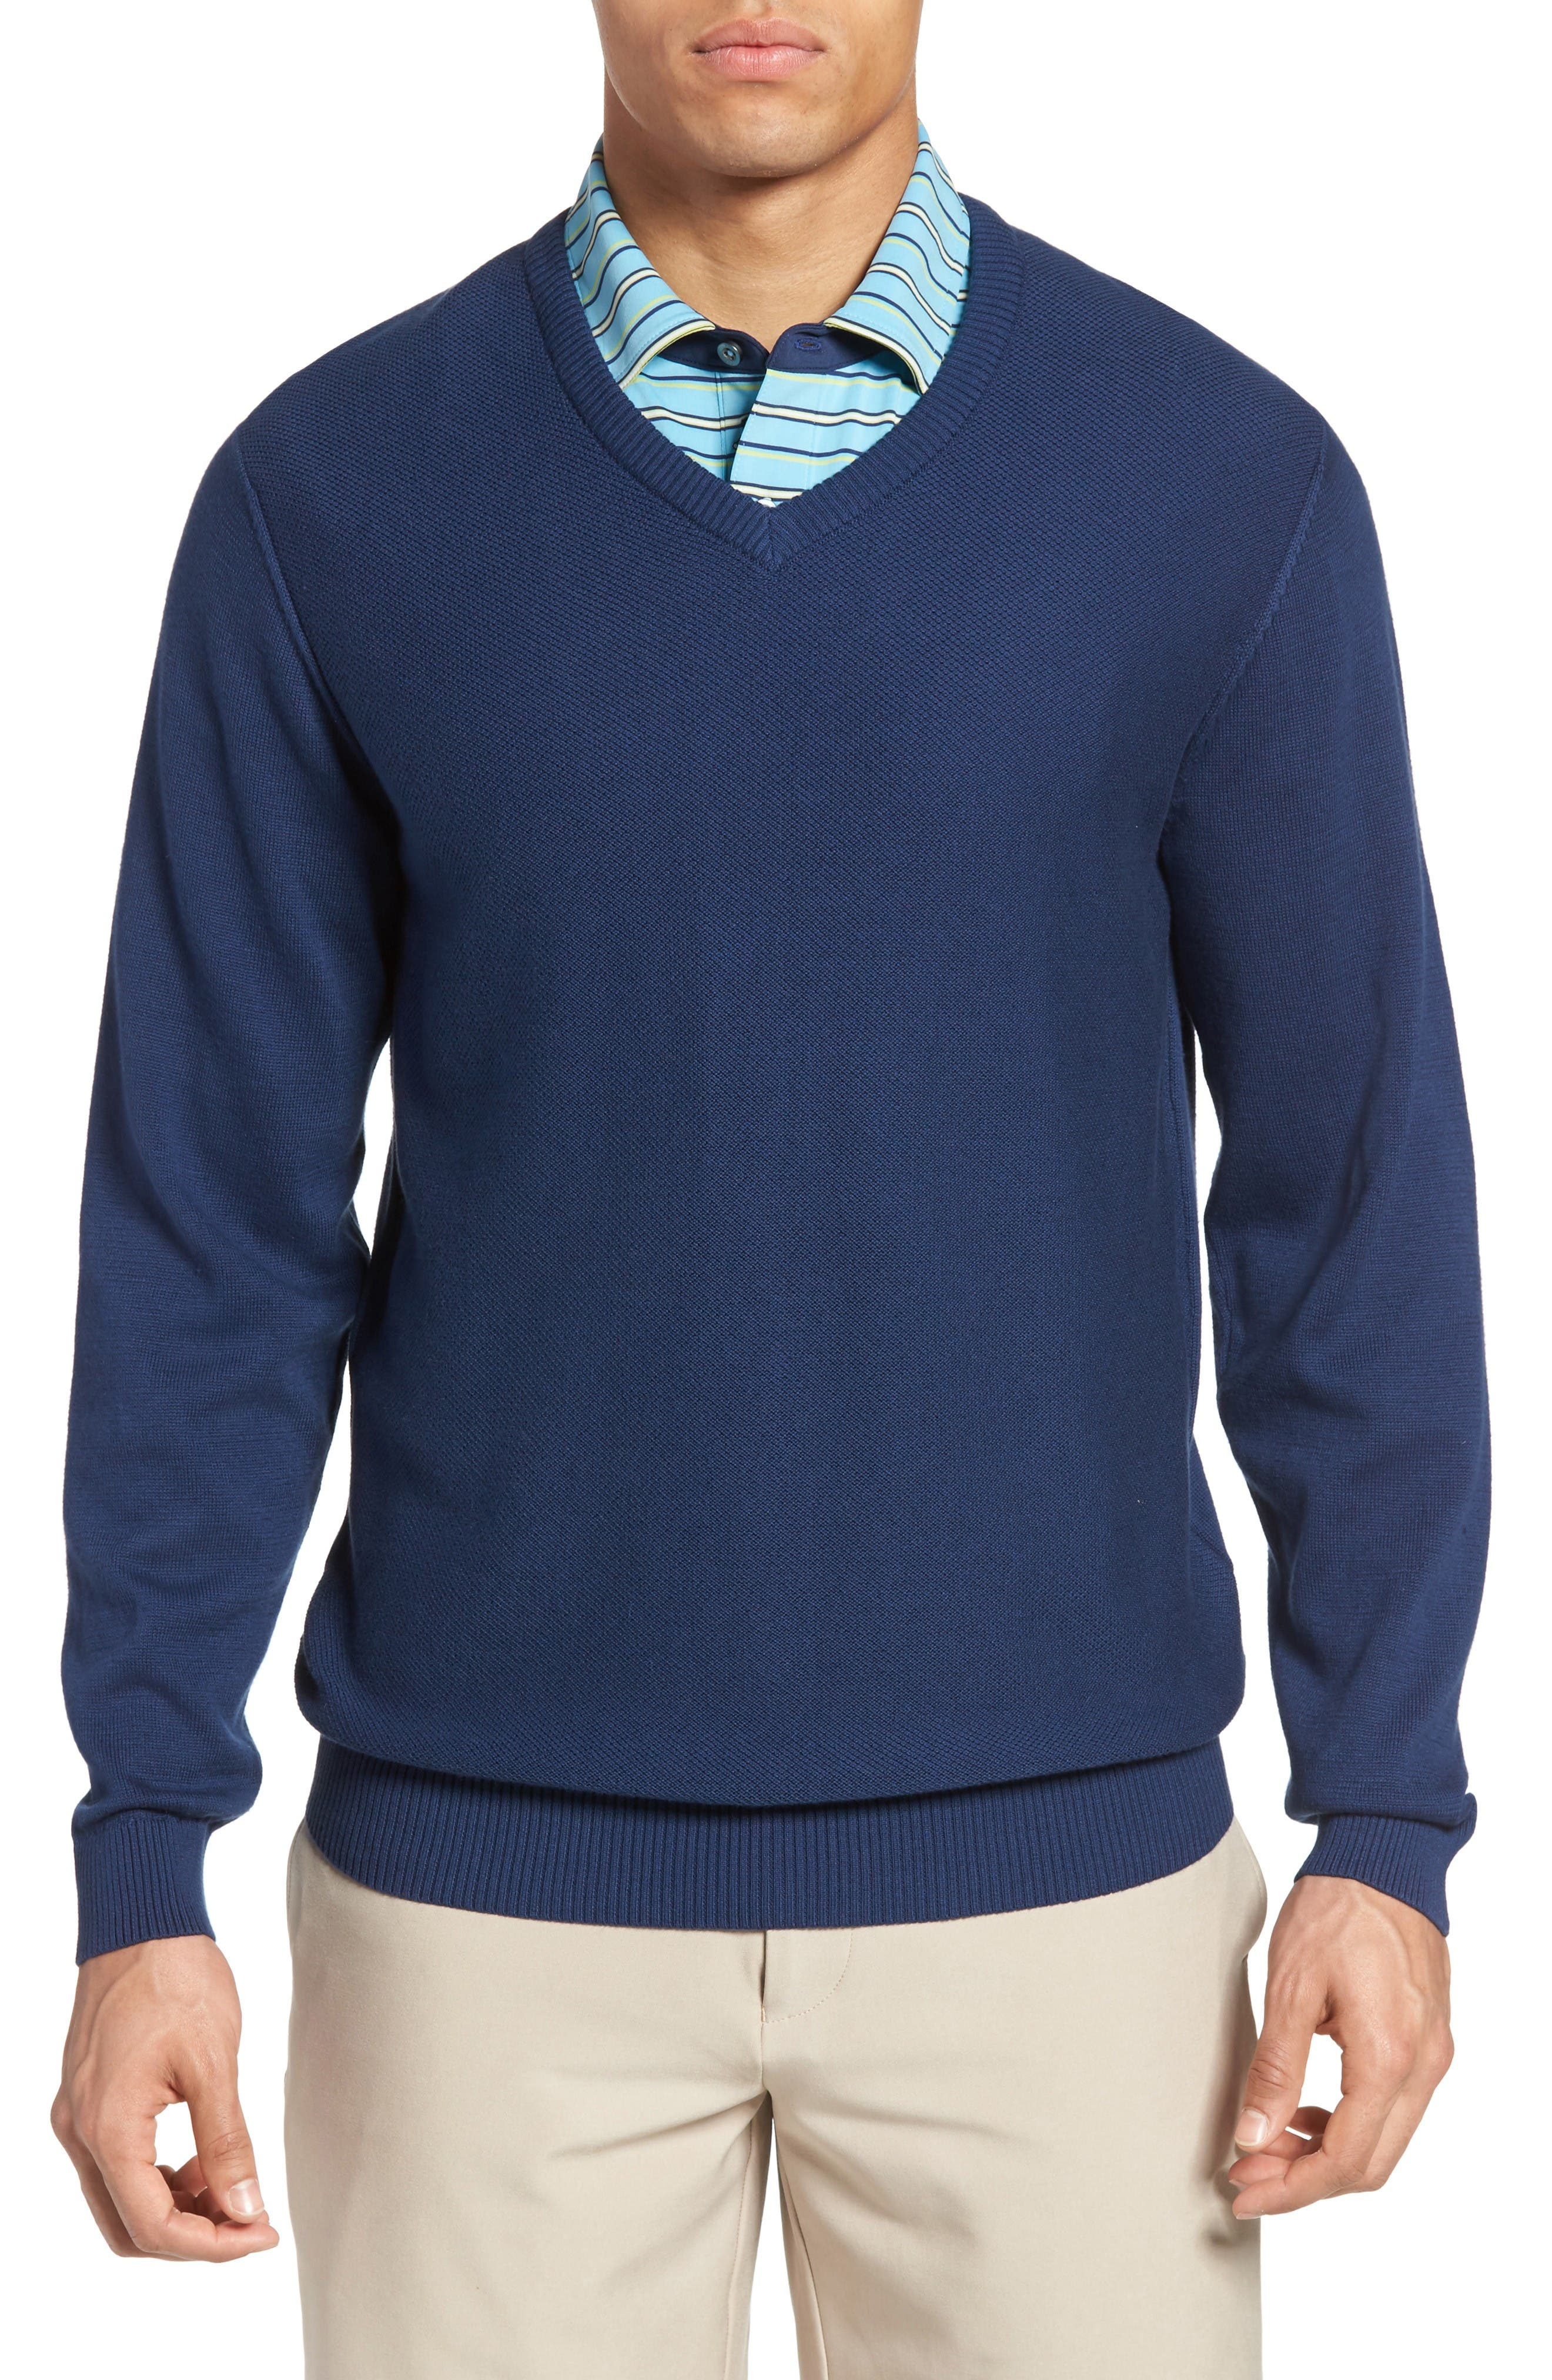 Piqué Jersey V-Neck Sweater,                             Main thumbnail 1, color,                             Summer Navy